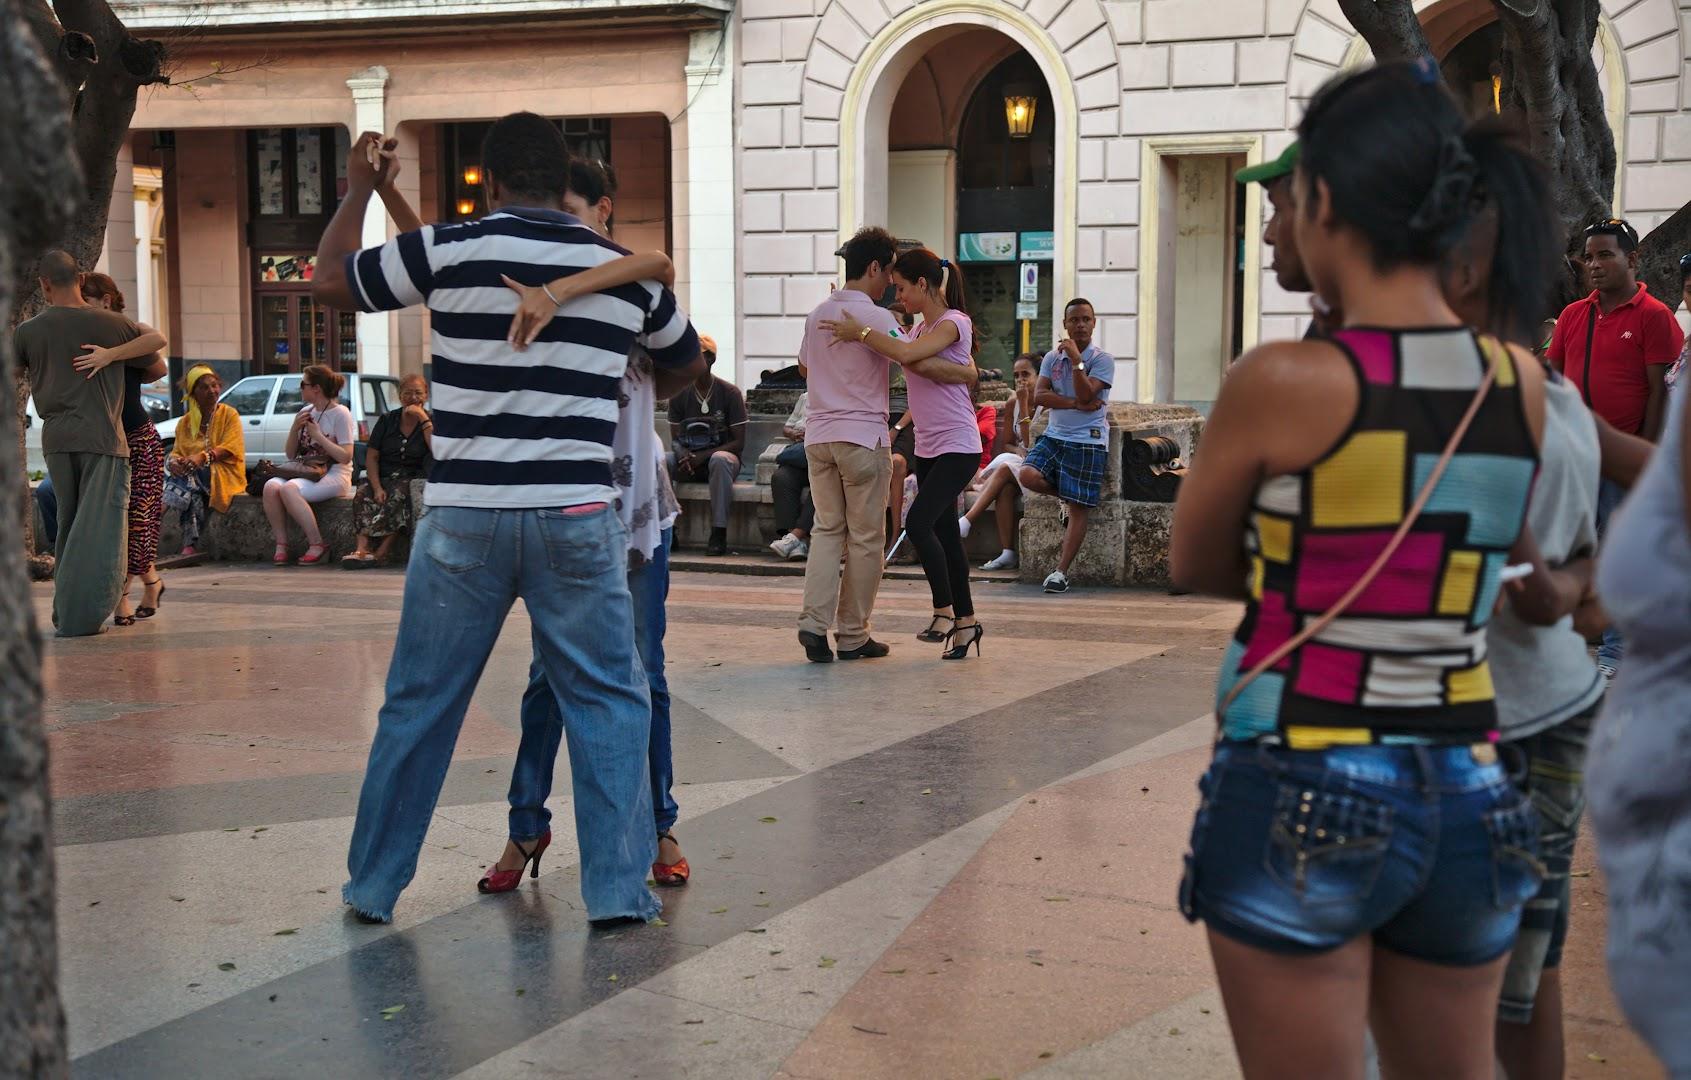 Salsa on the street